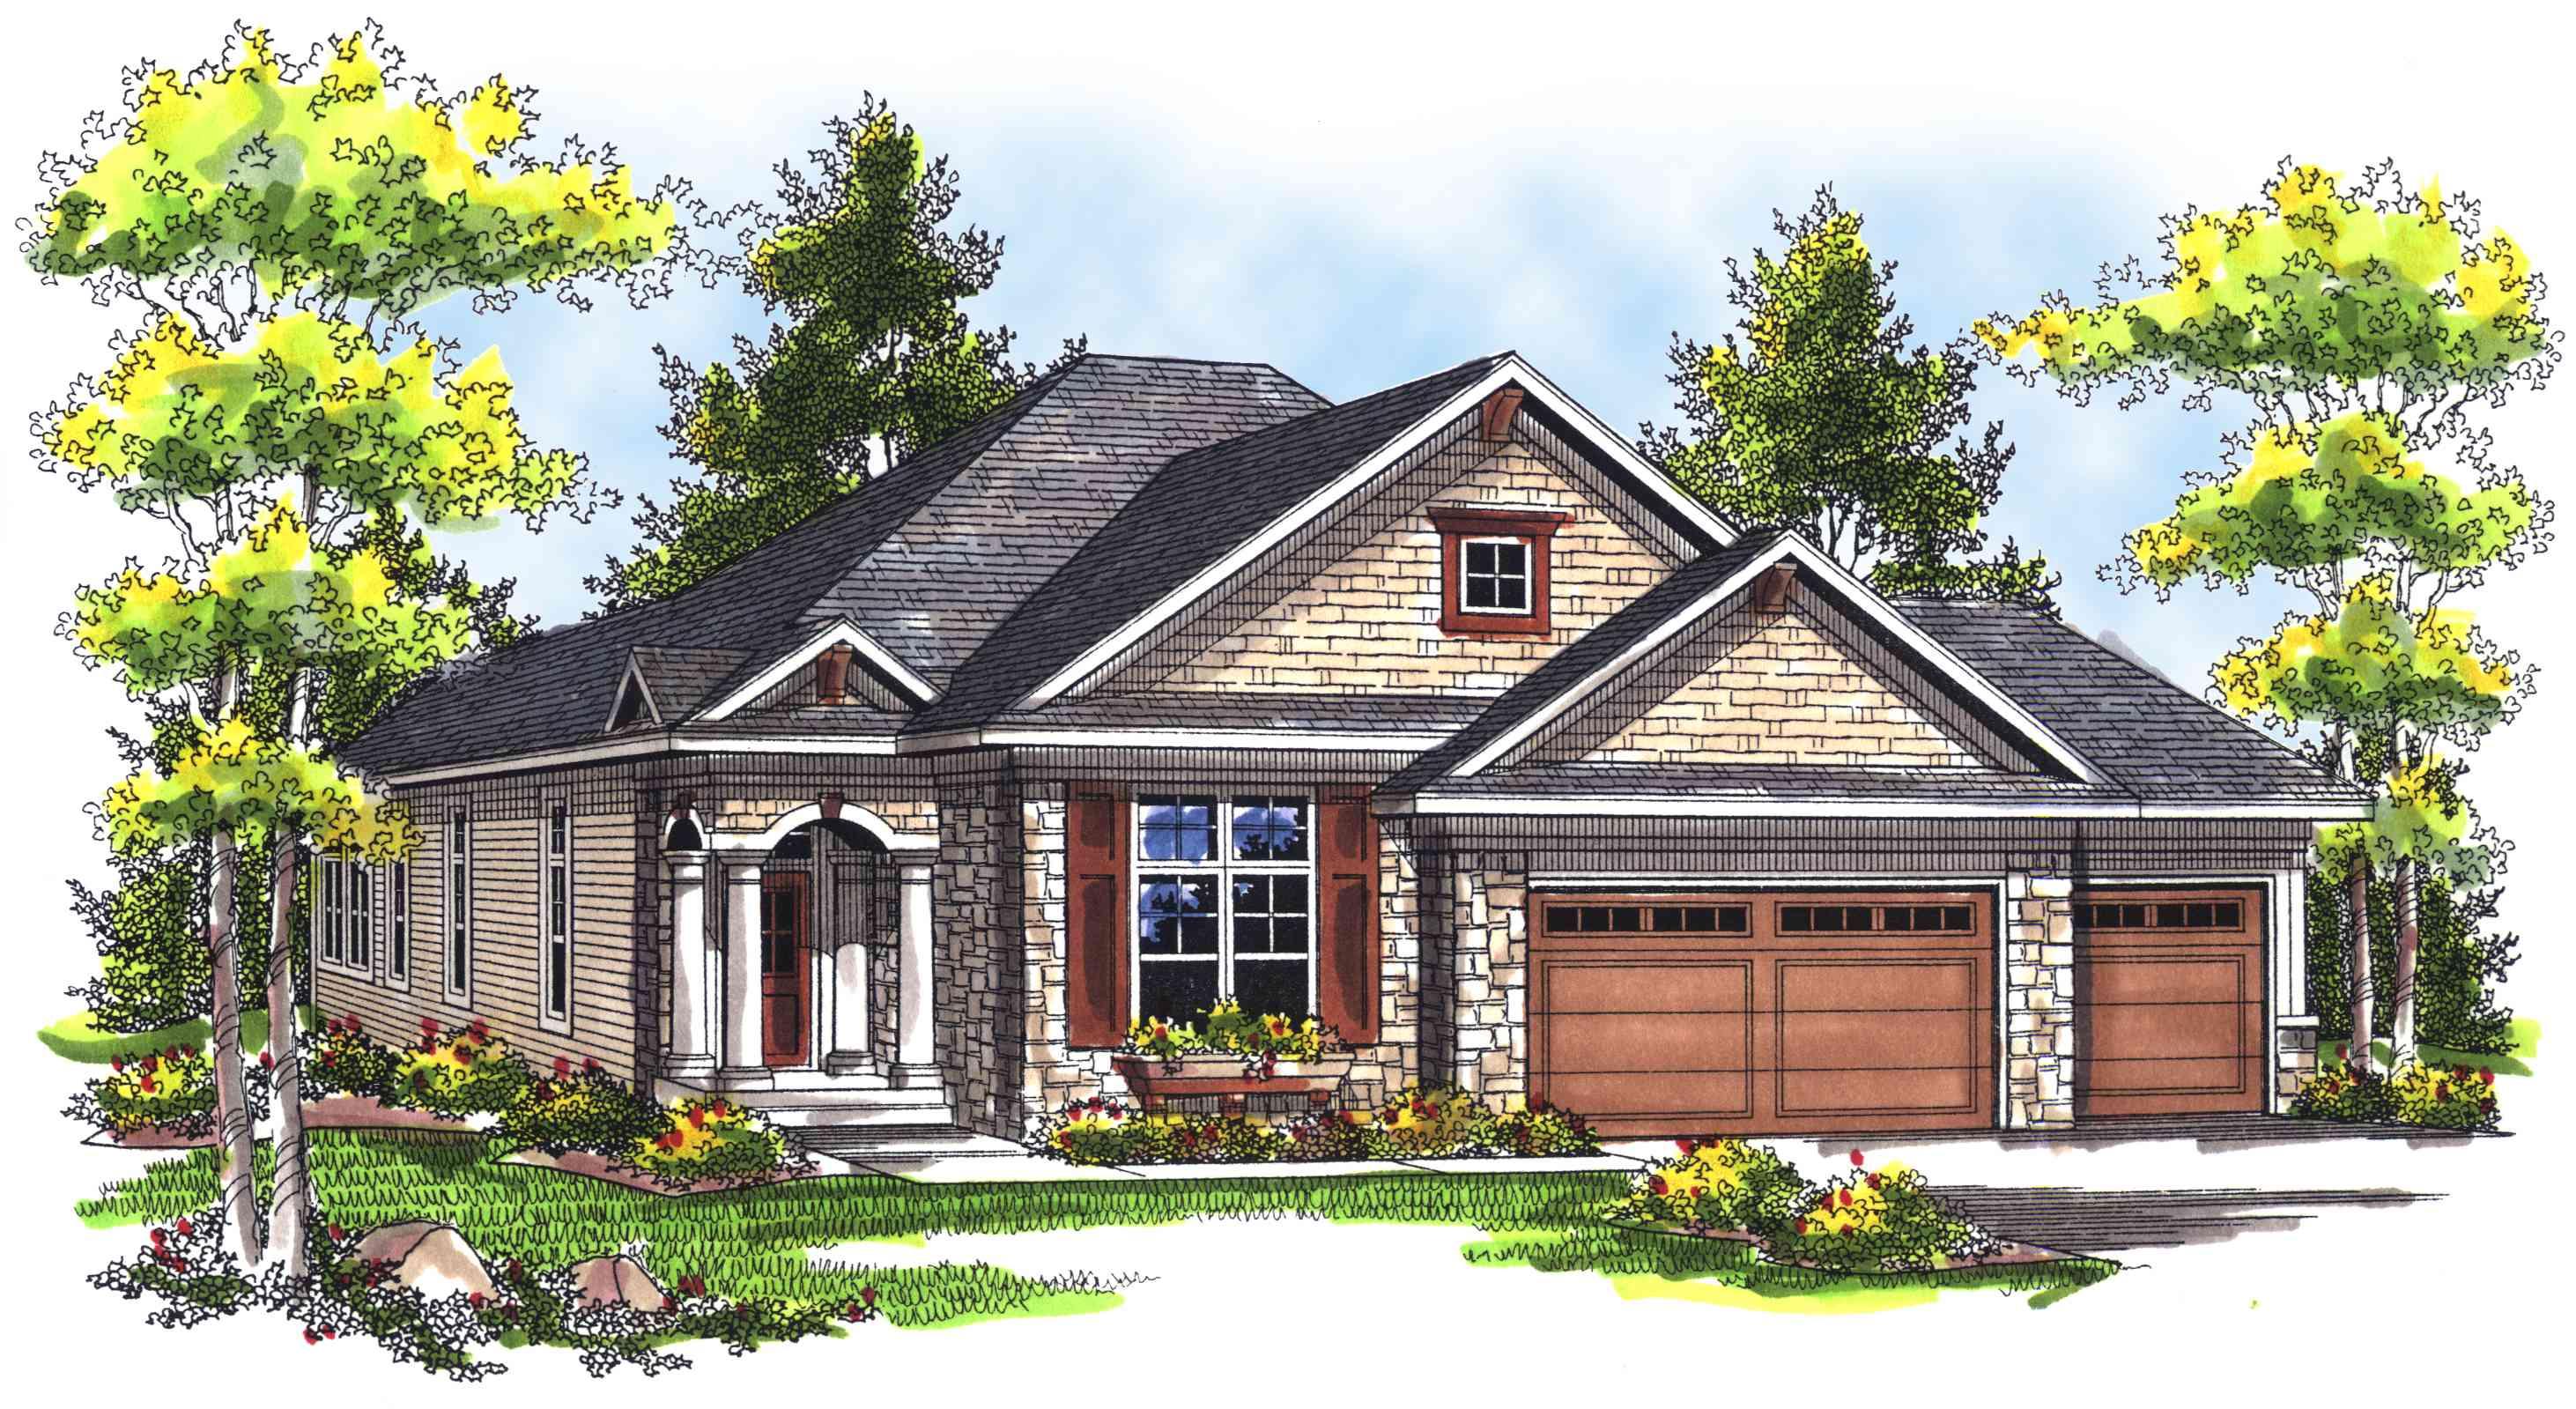 Narrow ranch 89312ah architectural designs house plans for Narrow ranch house plans